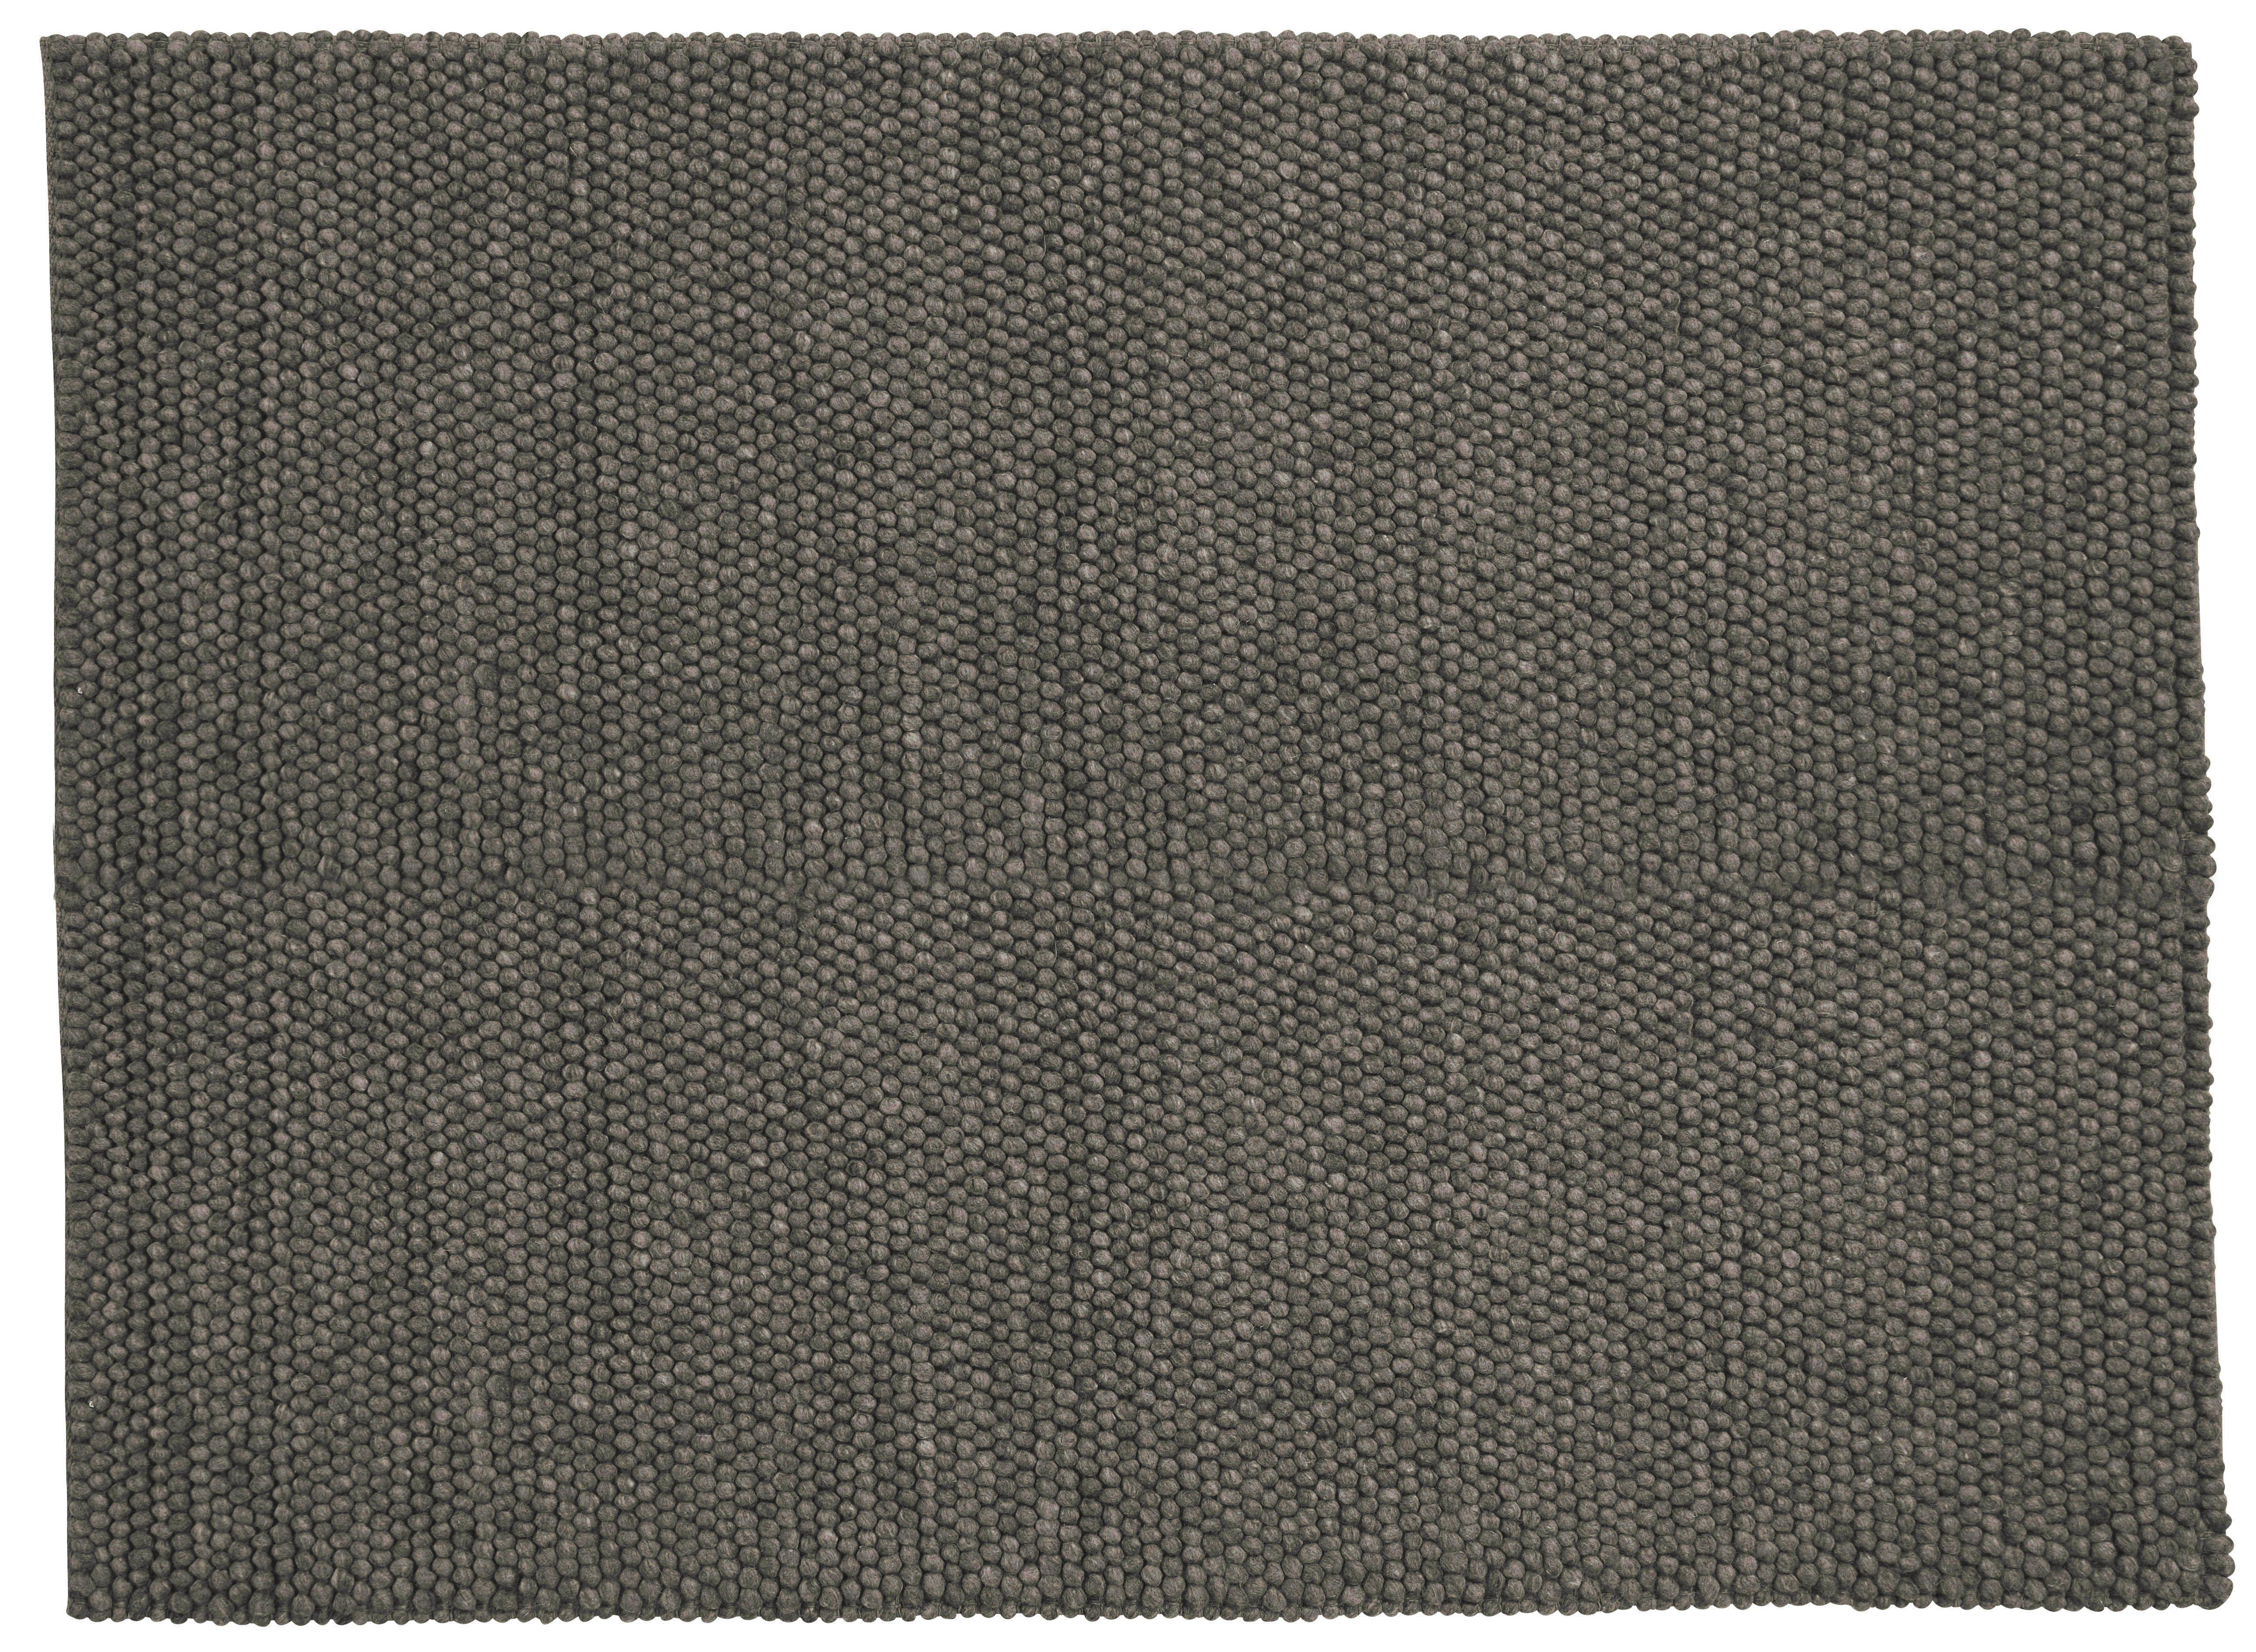 Decoration - Rugs - Peas Rug - 140 x 200 cm by Hay - Dark grey - Wool